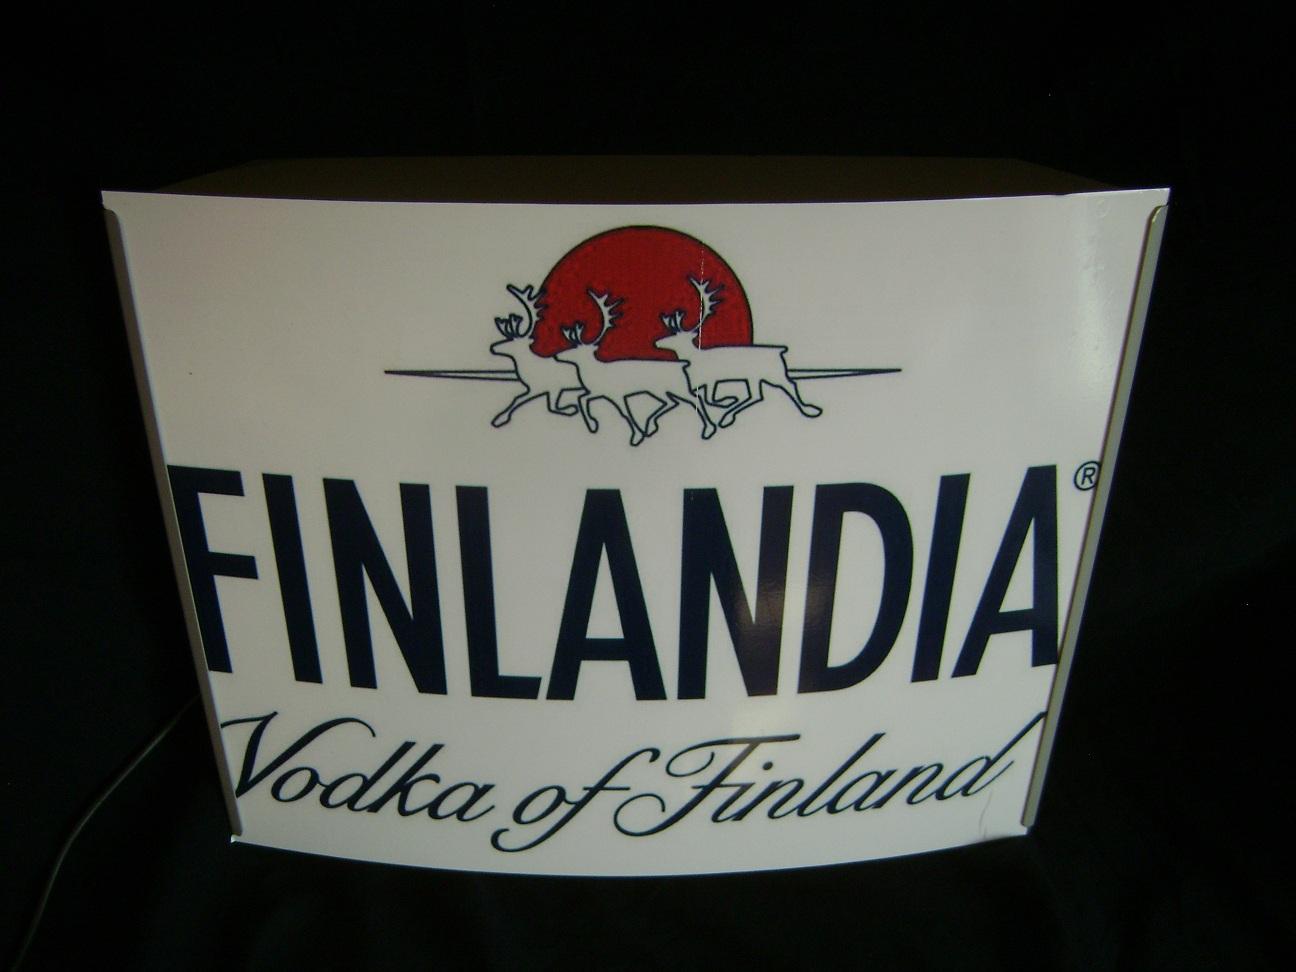 Reklama_svetleca_Finlandia_vodka_4.jpg